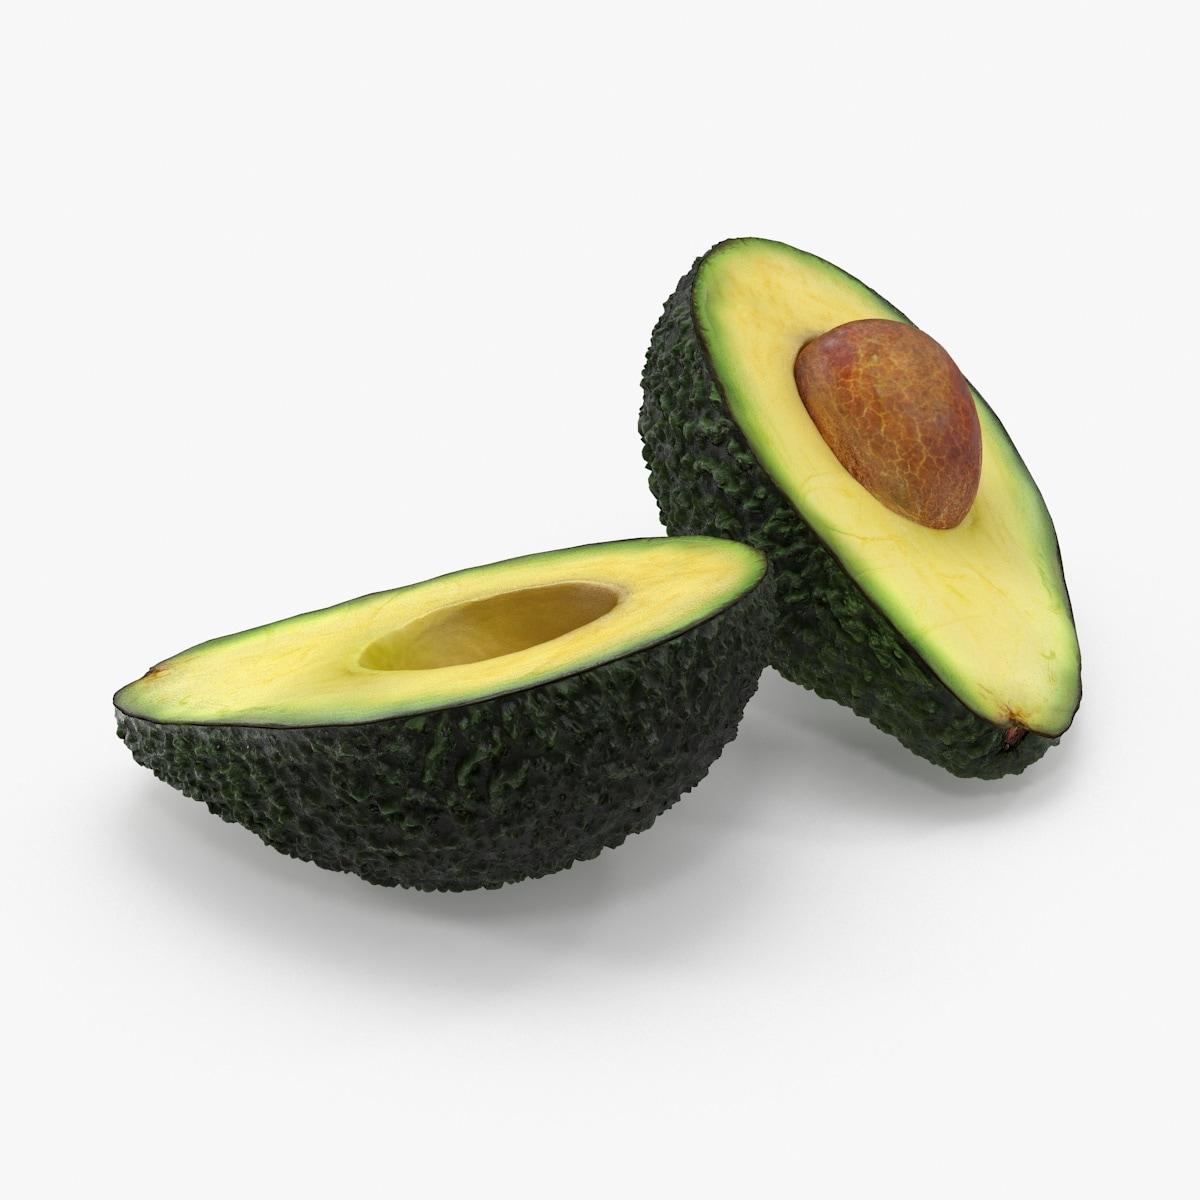 avocado cross section 3d c4d